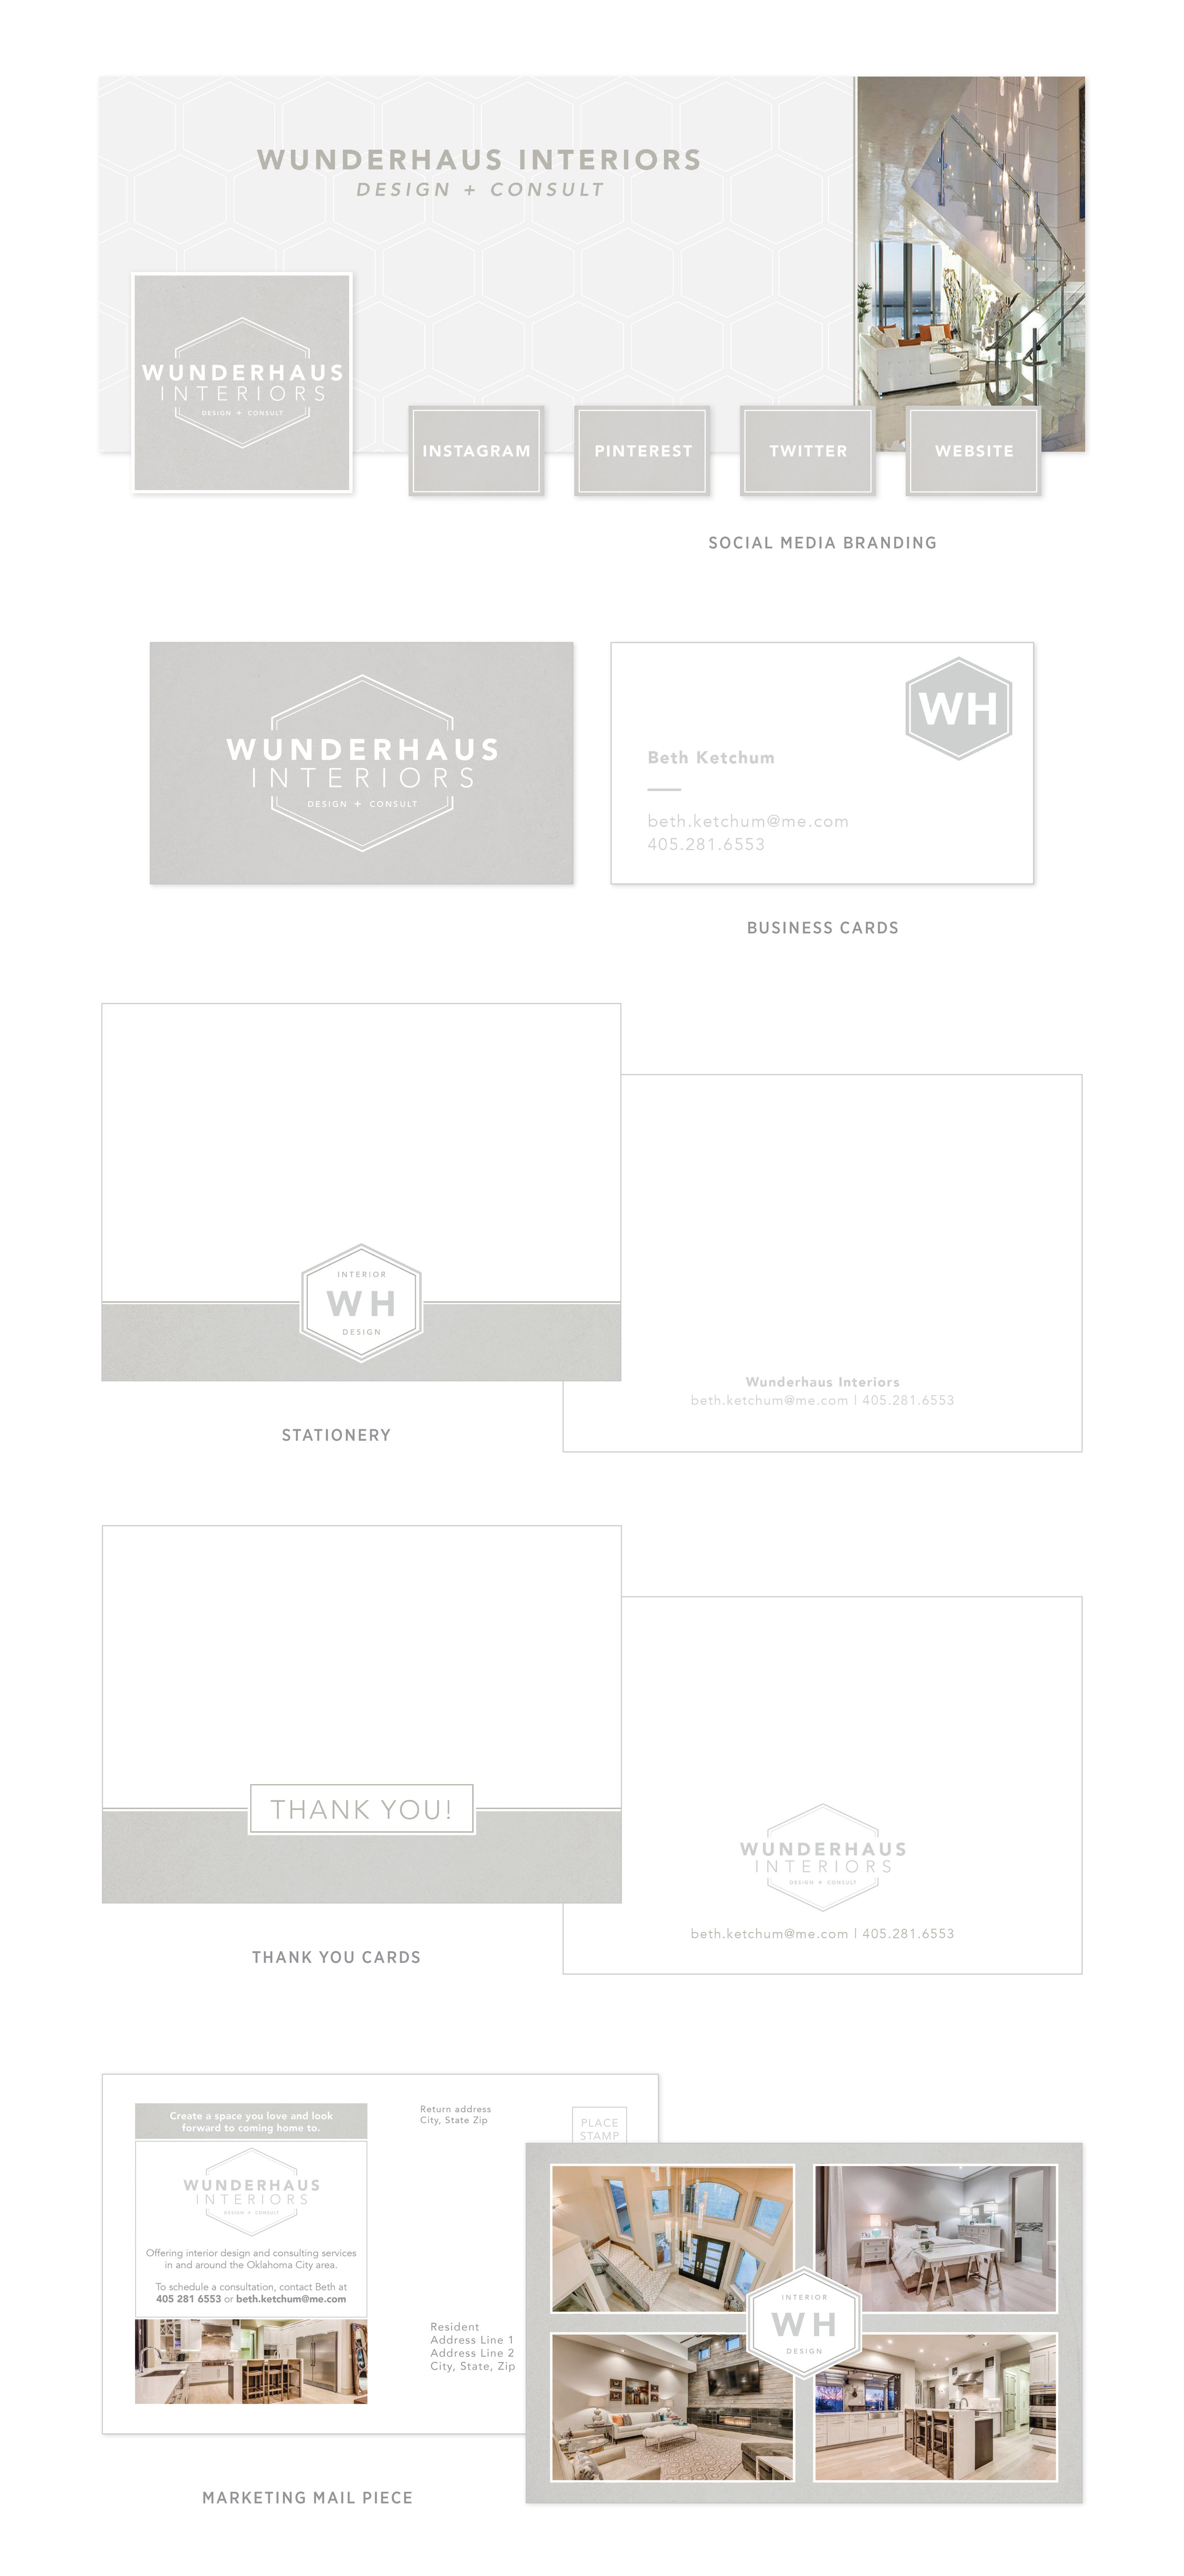 Wunderhaus Interiors branding + collateral design   casilong.com #casilongdesign #fearlesspursuit #branding